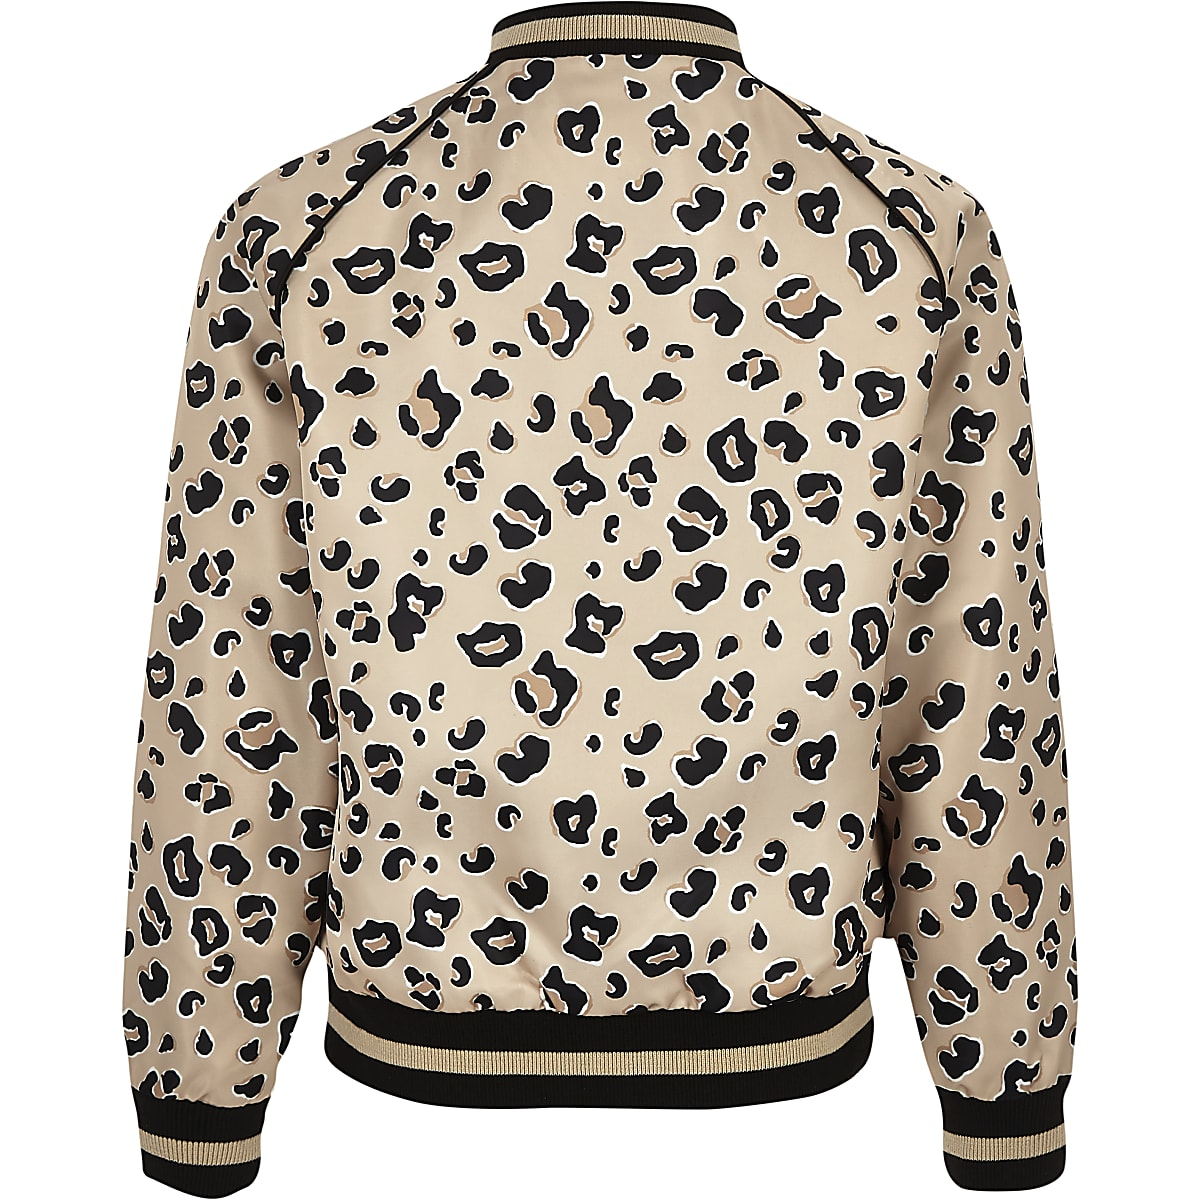 bdd13855ebf4 Girls beige leopard print bomber jacket - Jackets - Coats & Jackets ...